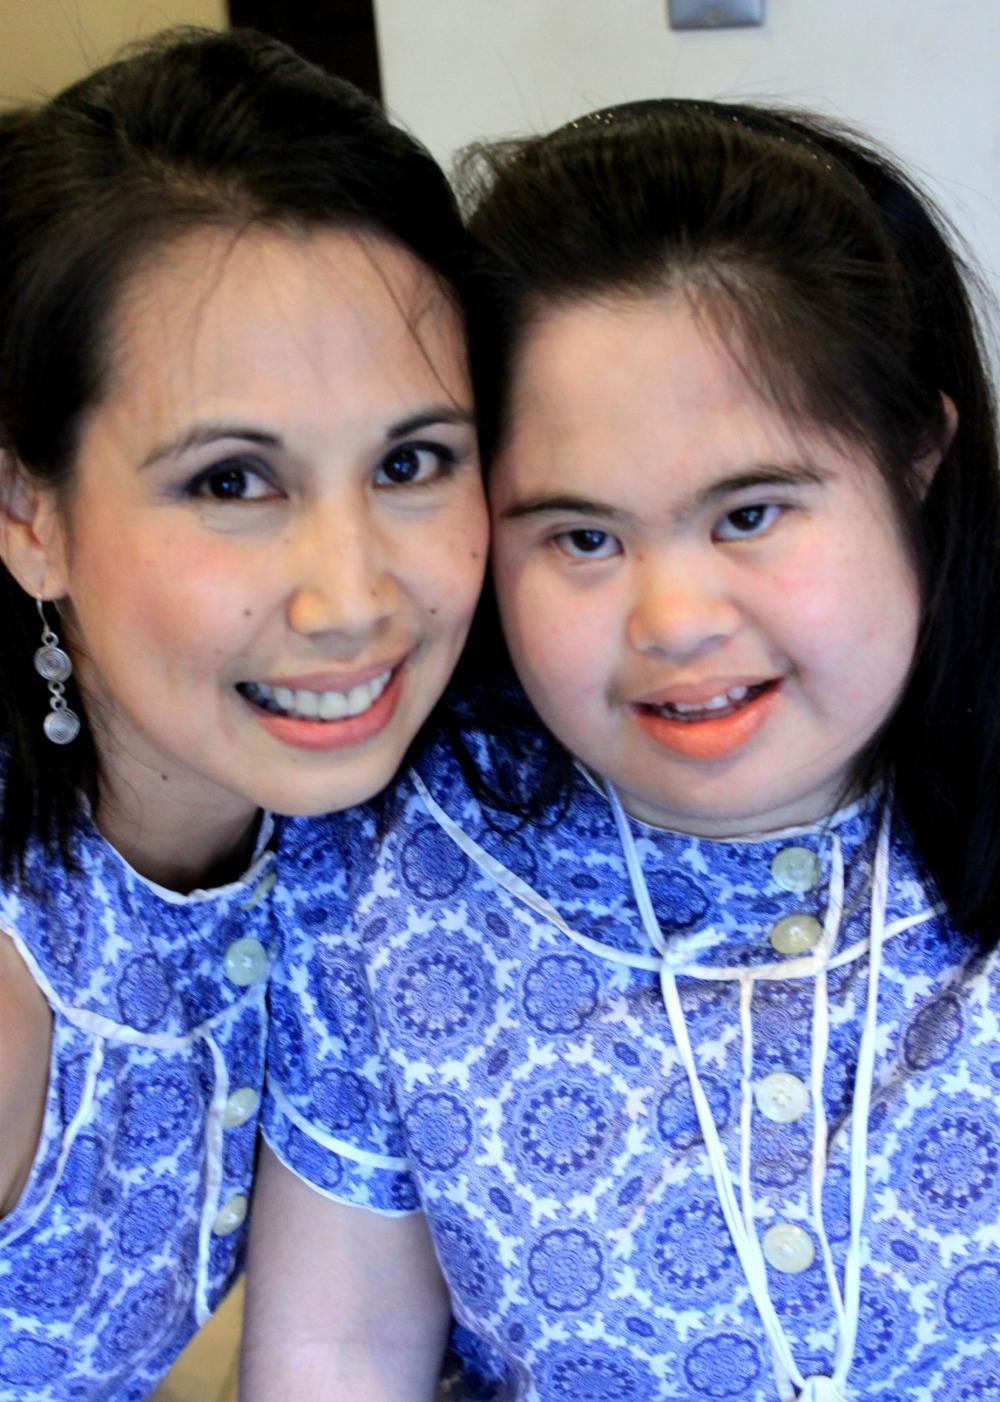 Malu and her daughter, Clarissa